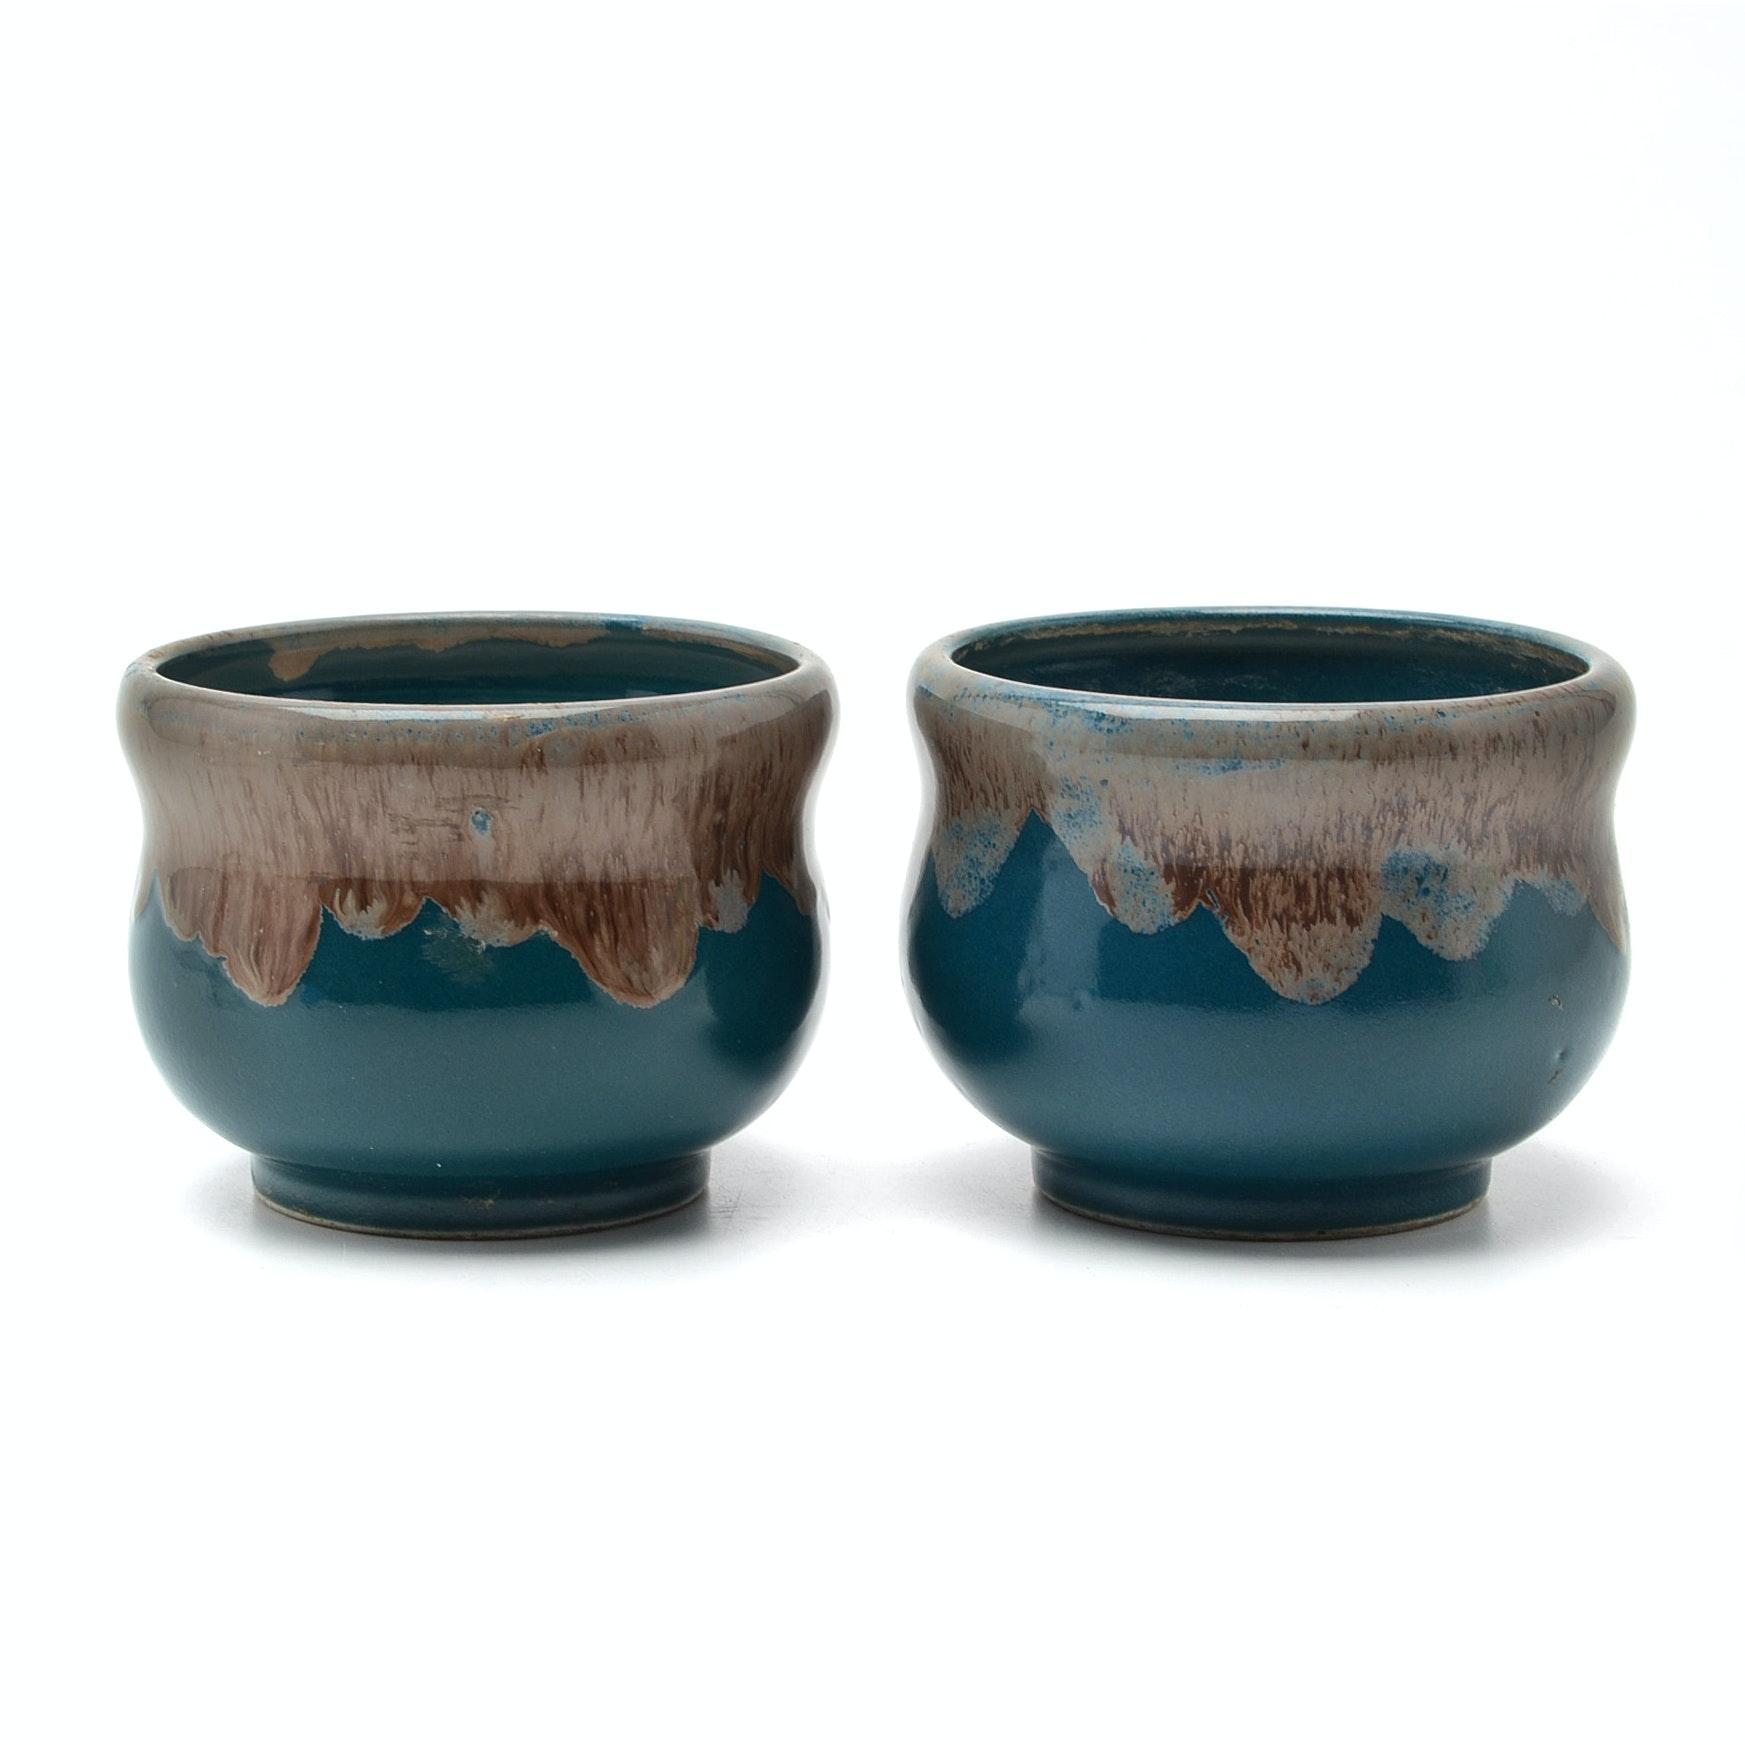 Pair of Japanese Green Glazed Porcelain Tea Bowls